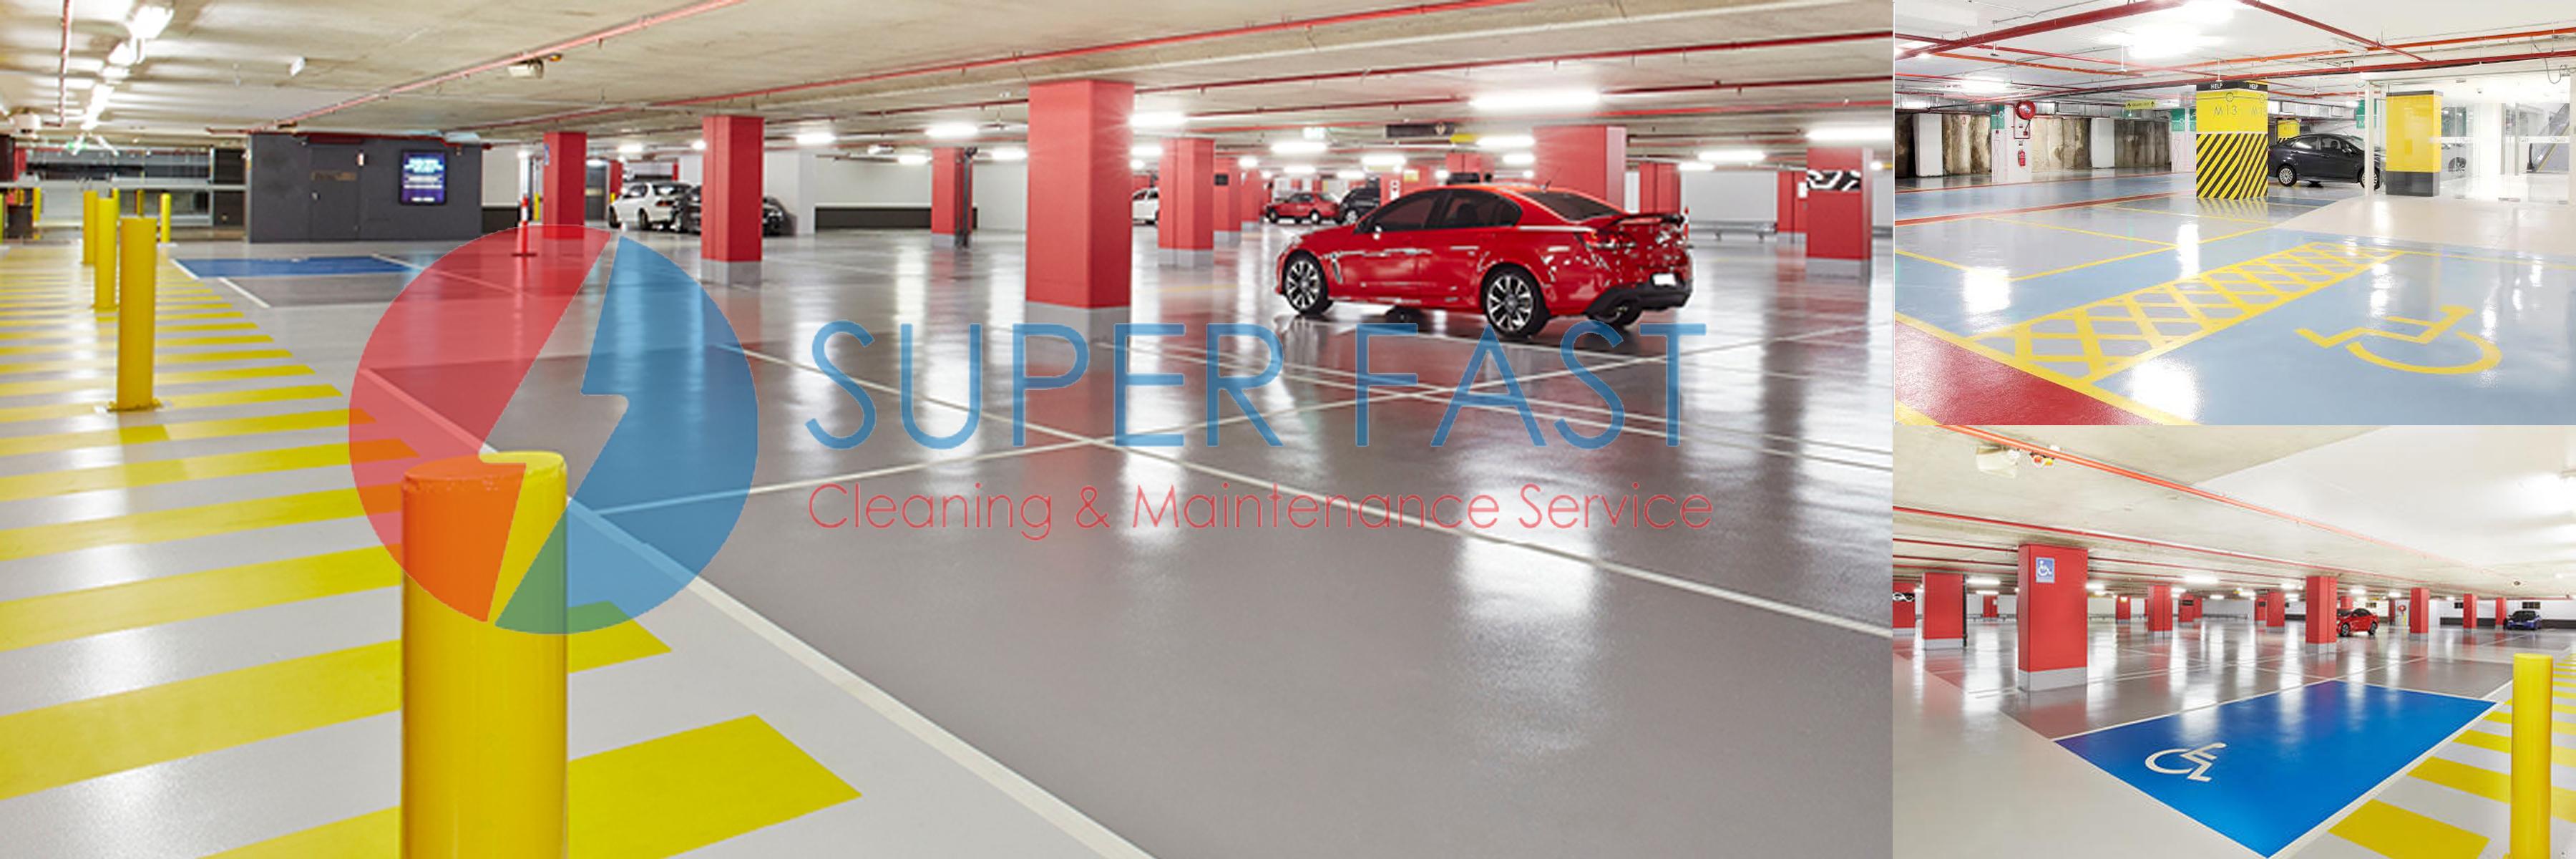 Epoxy Floor Coating UAE | Super Fast Cleaning & Maintenance